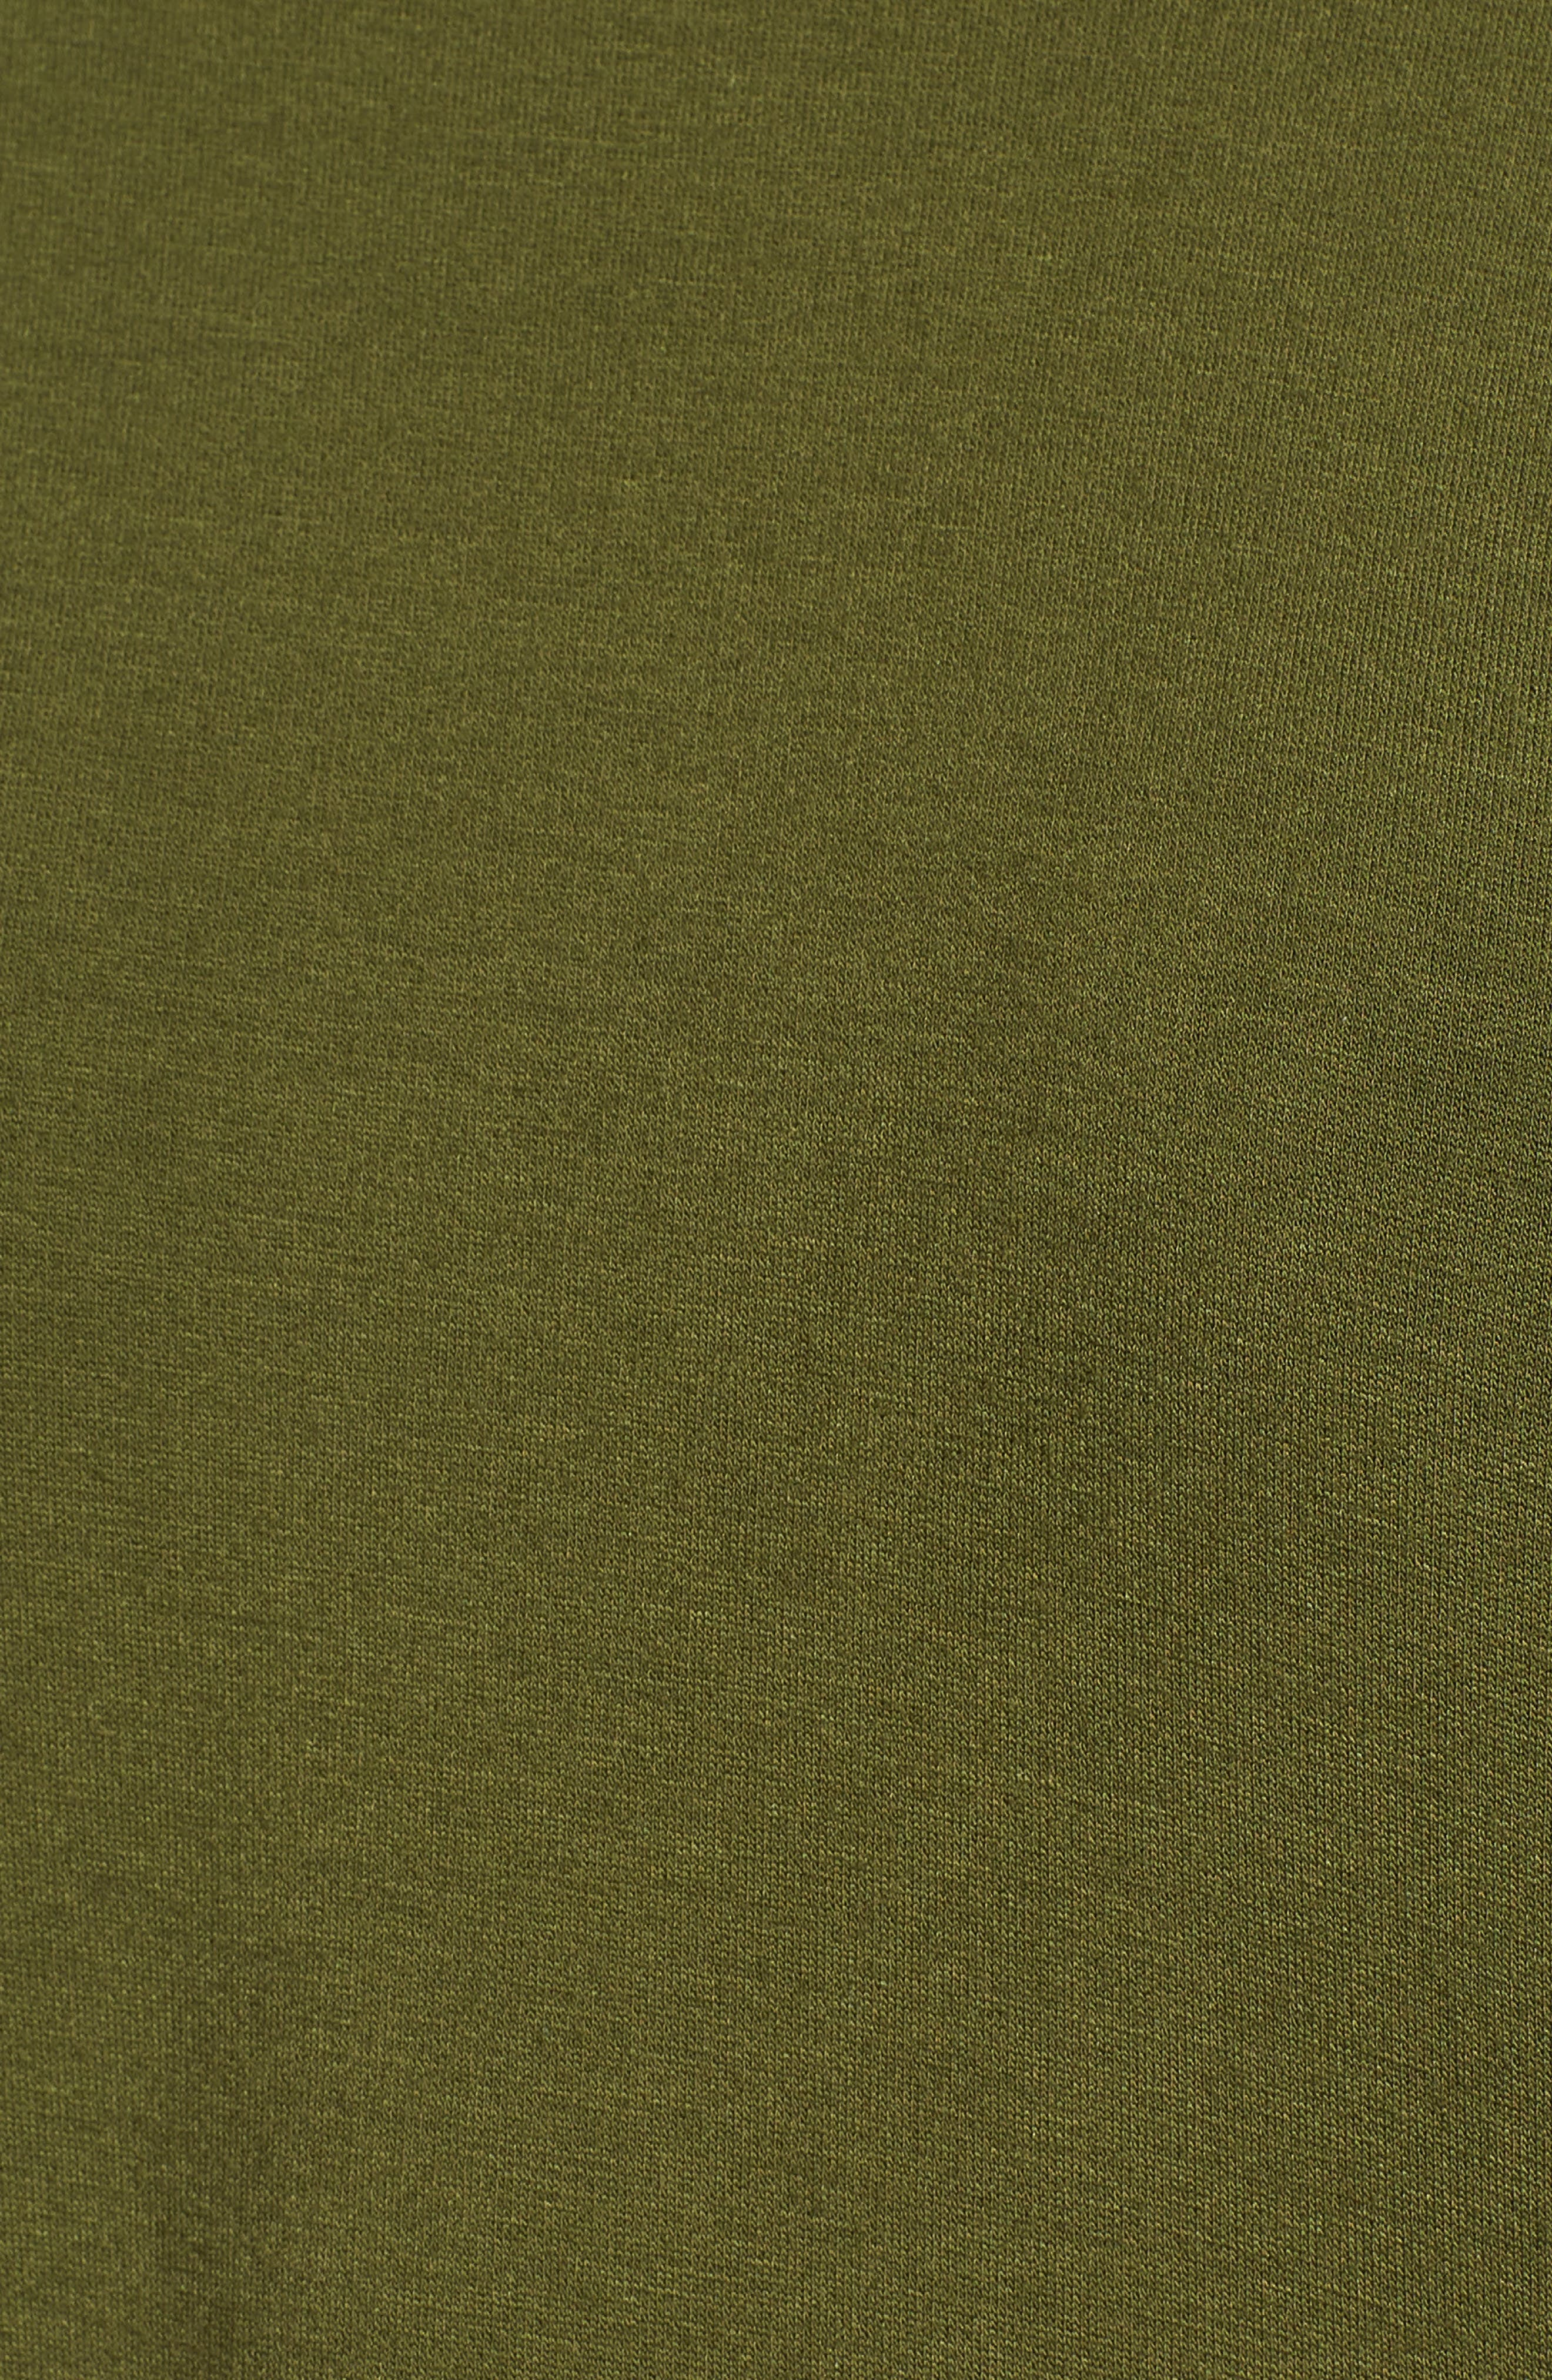 Raglan Sweatshirt,                             Alternate thumbnail 11, color,